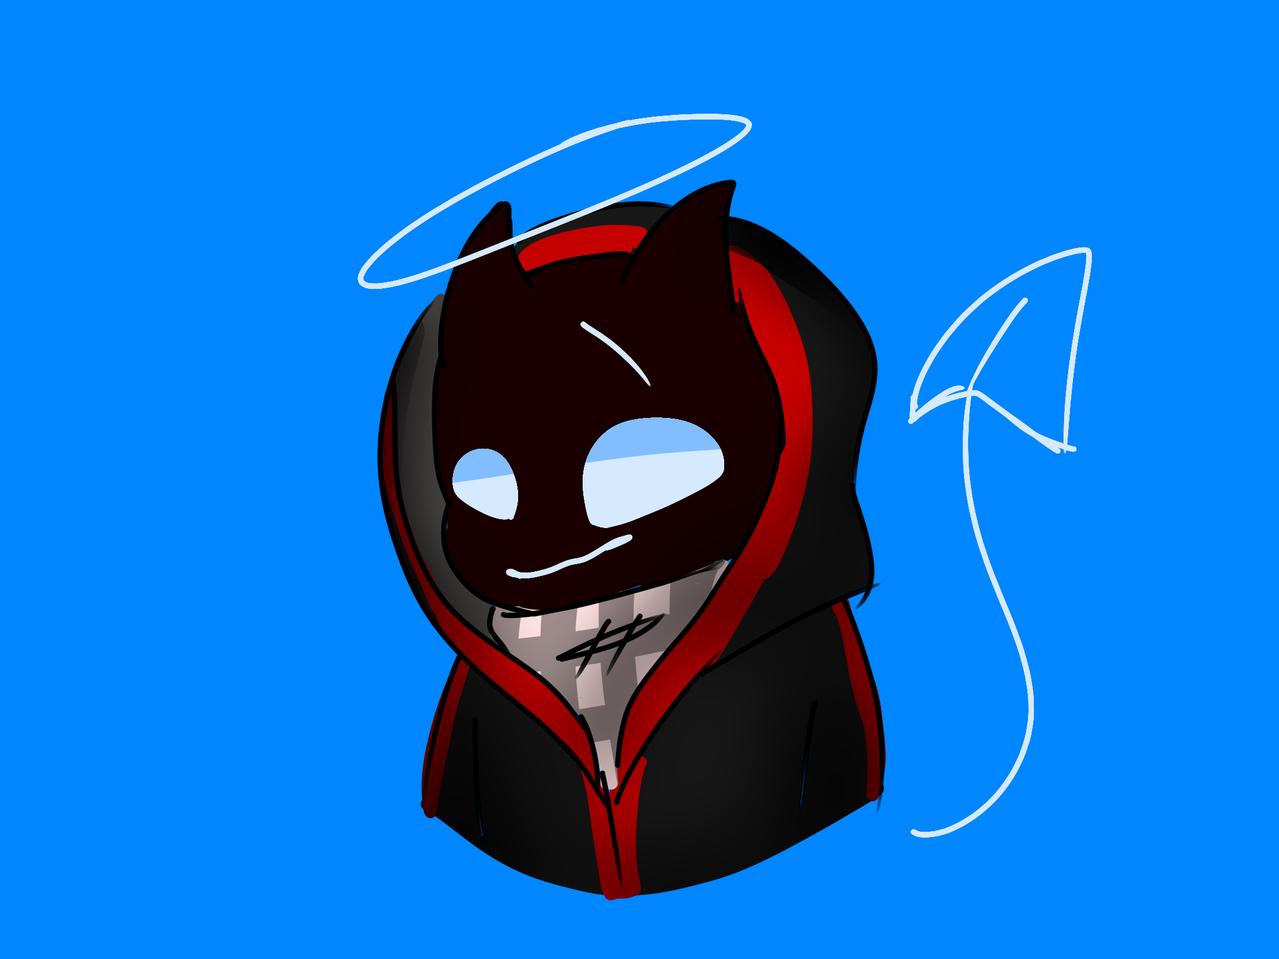 Bbh Illust of GhostTheBeast (Logan mode) badboyhalo blue Bbh red